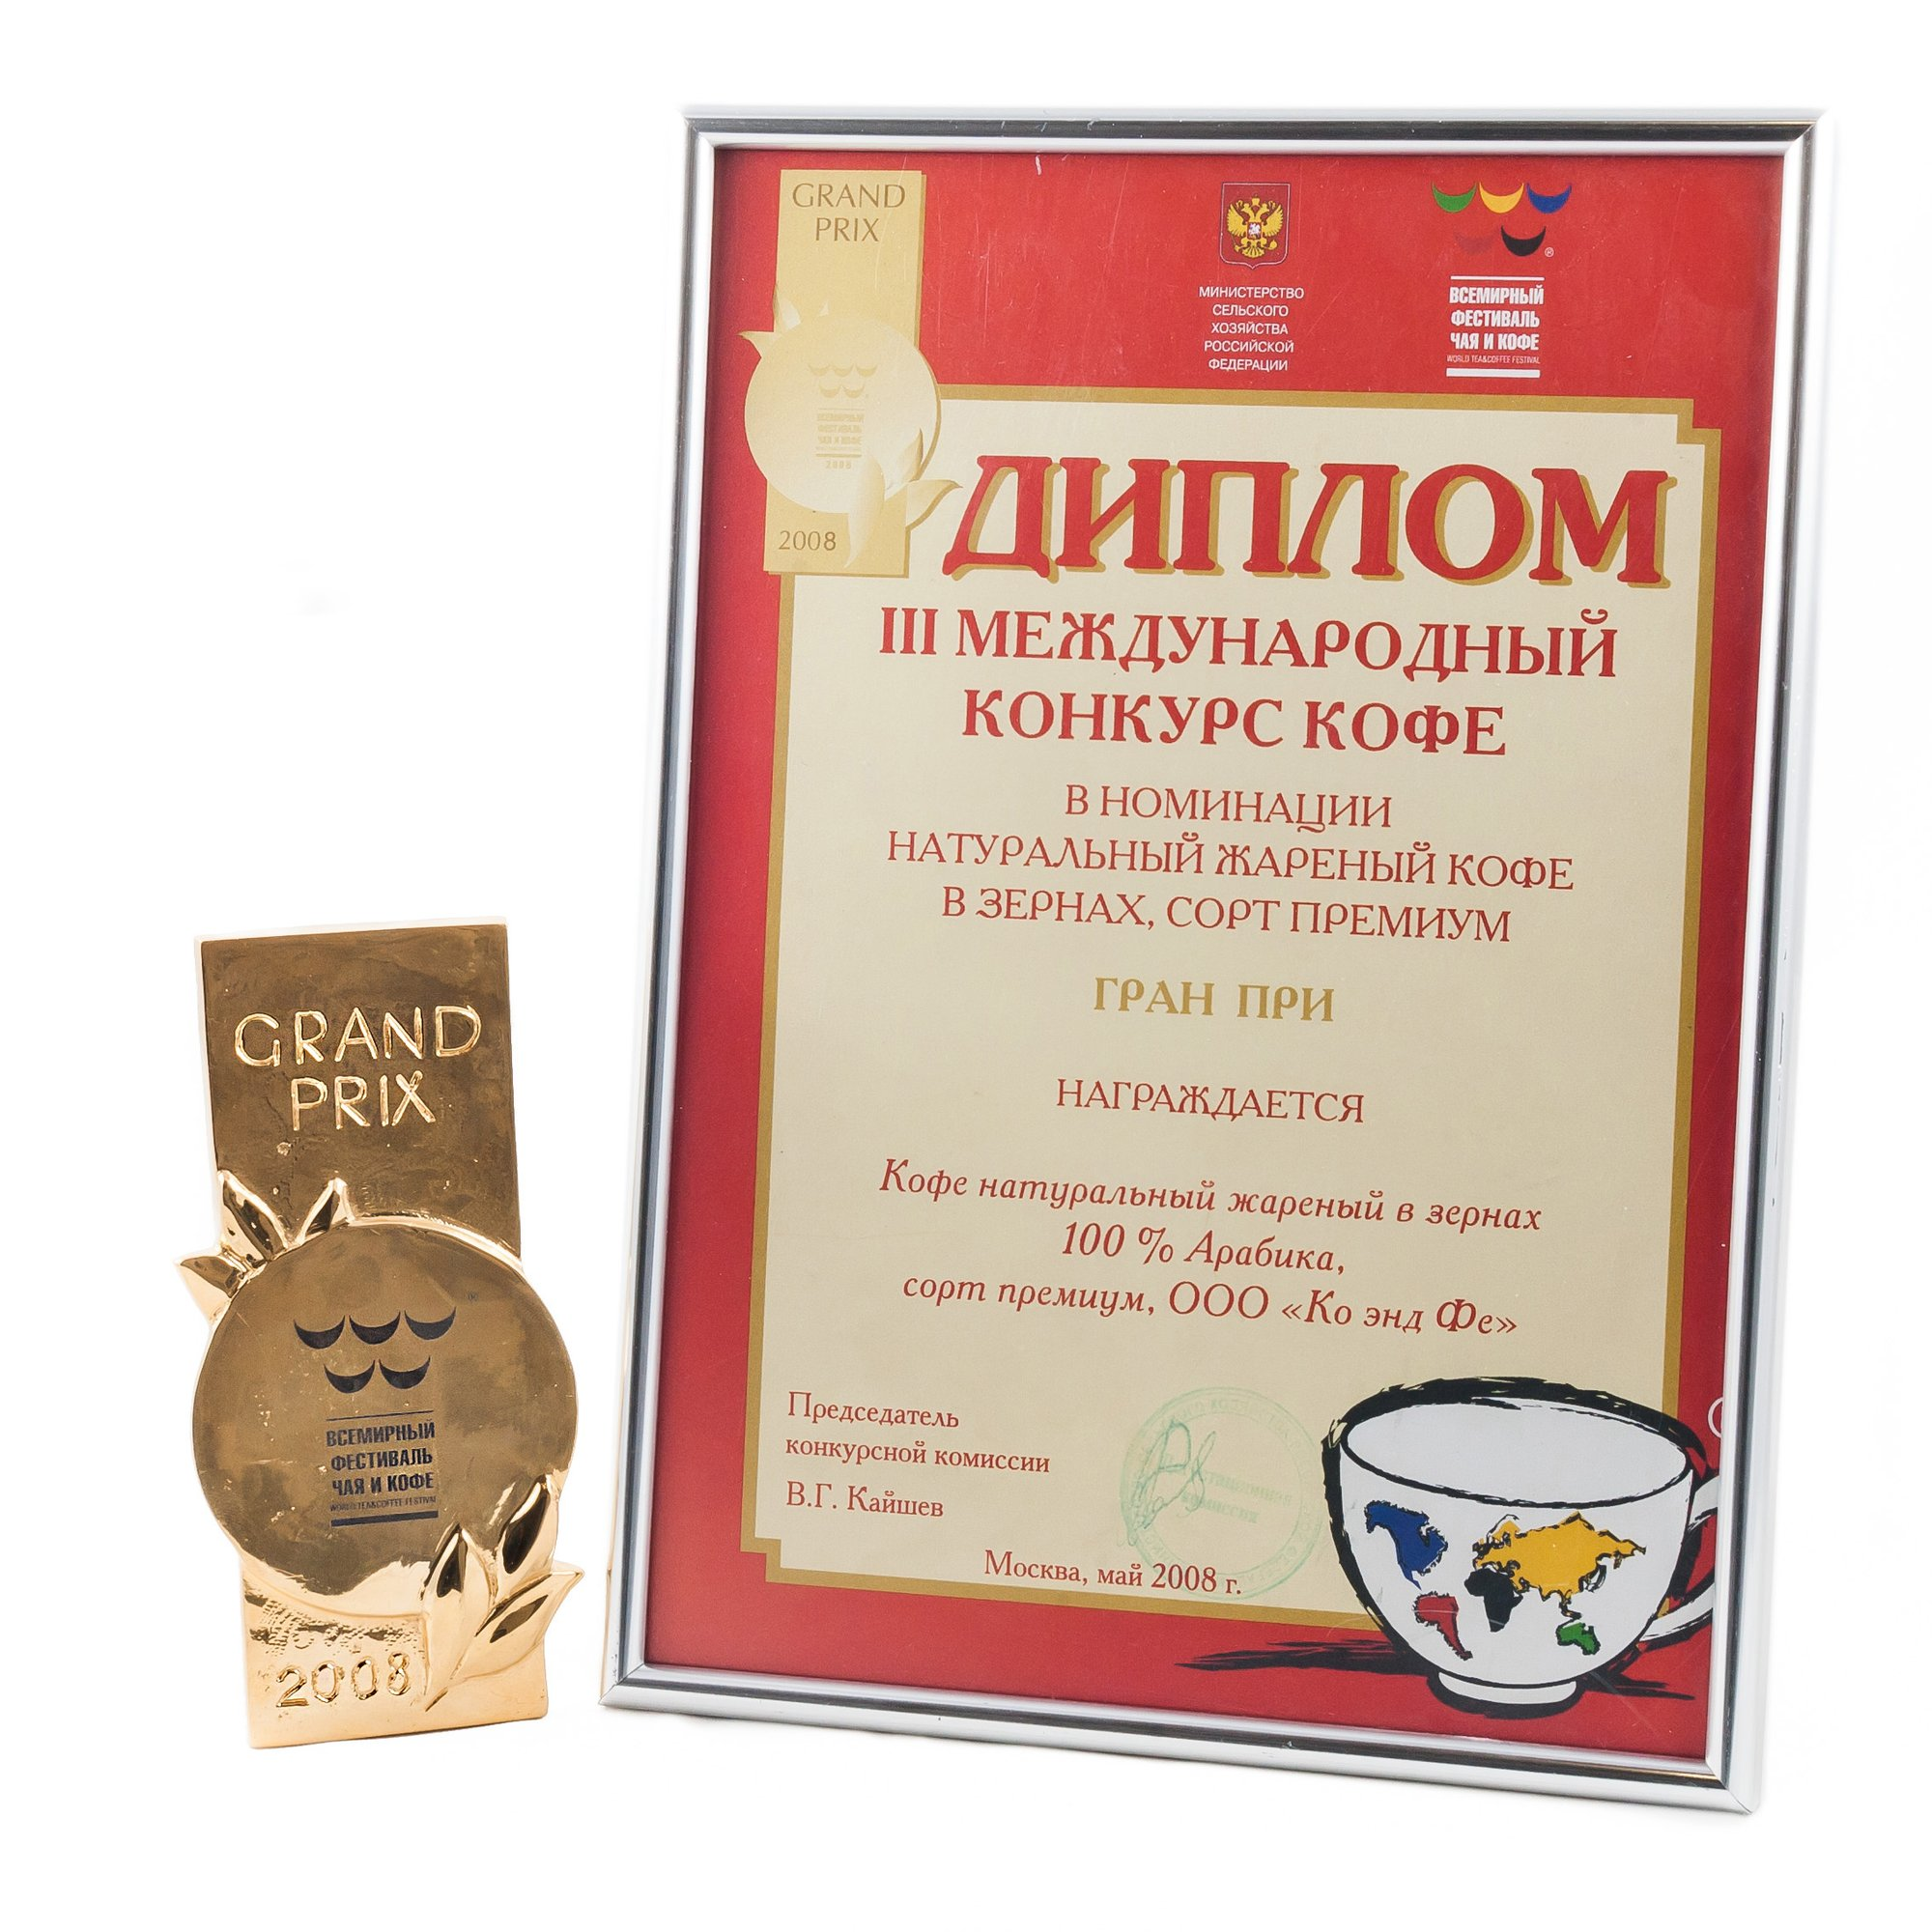 2008-vsemirnyi-festival-chaja-i-kofe-granpri.jpg